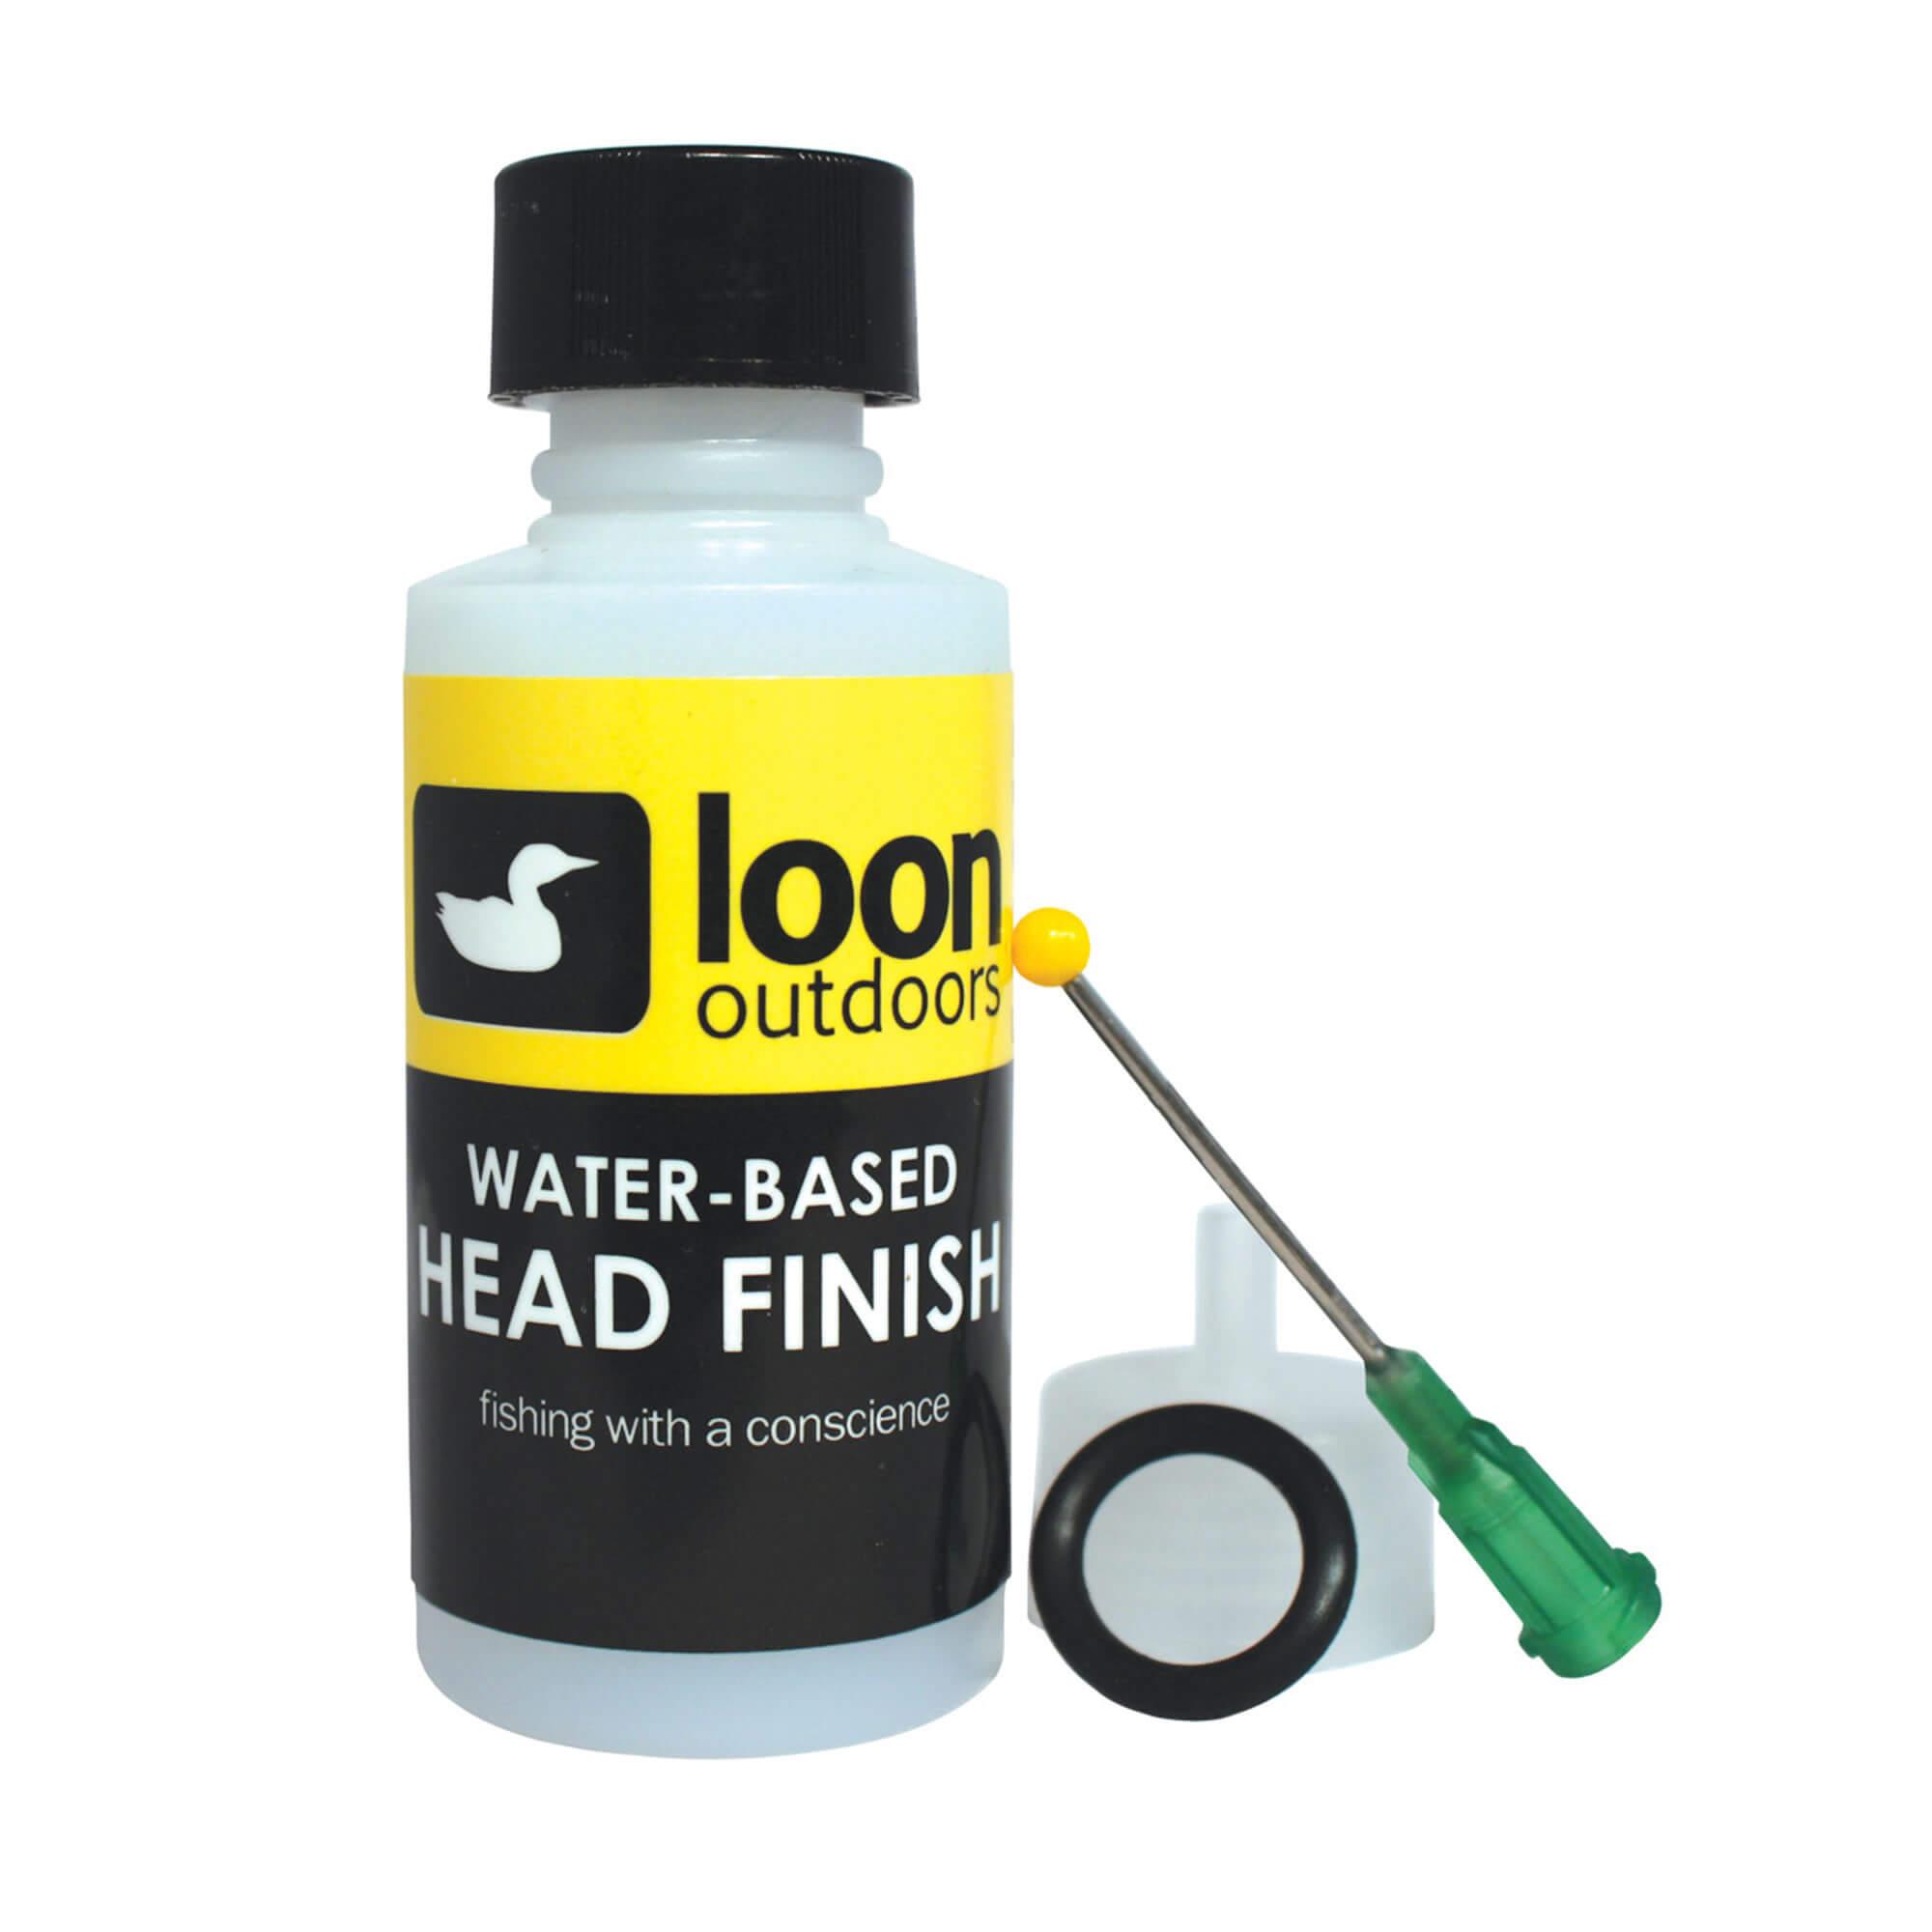 Loon Head Finish System